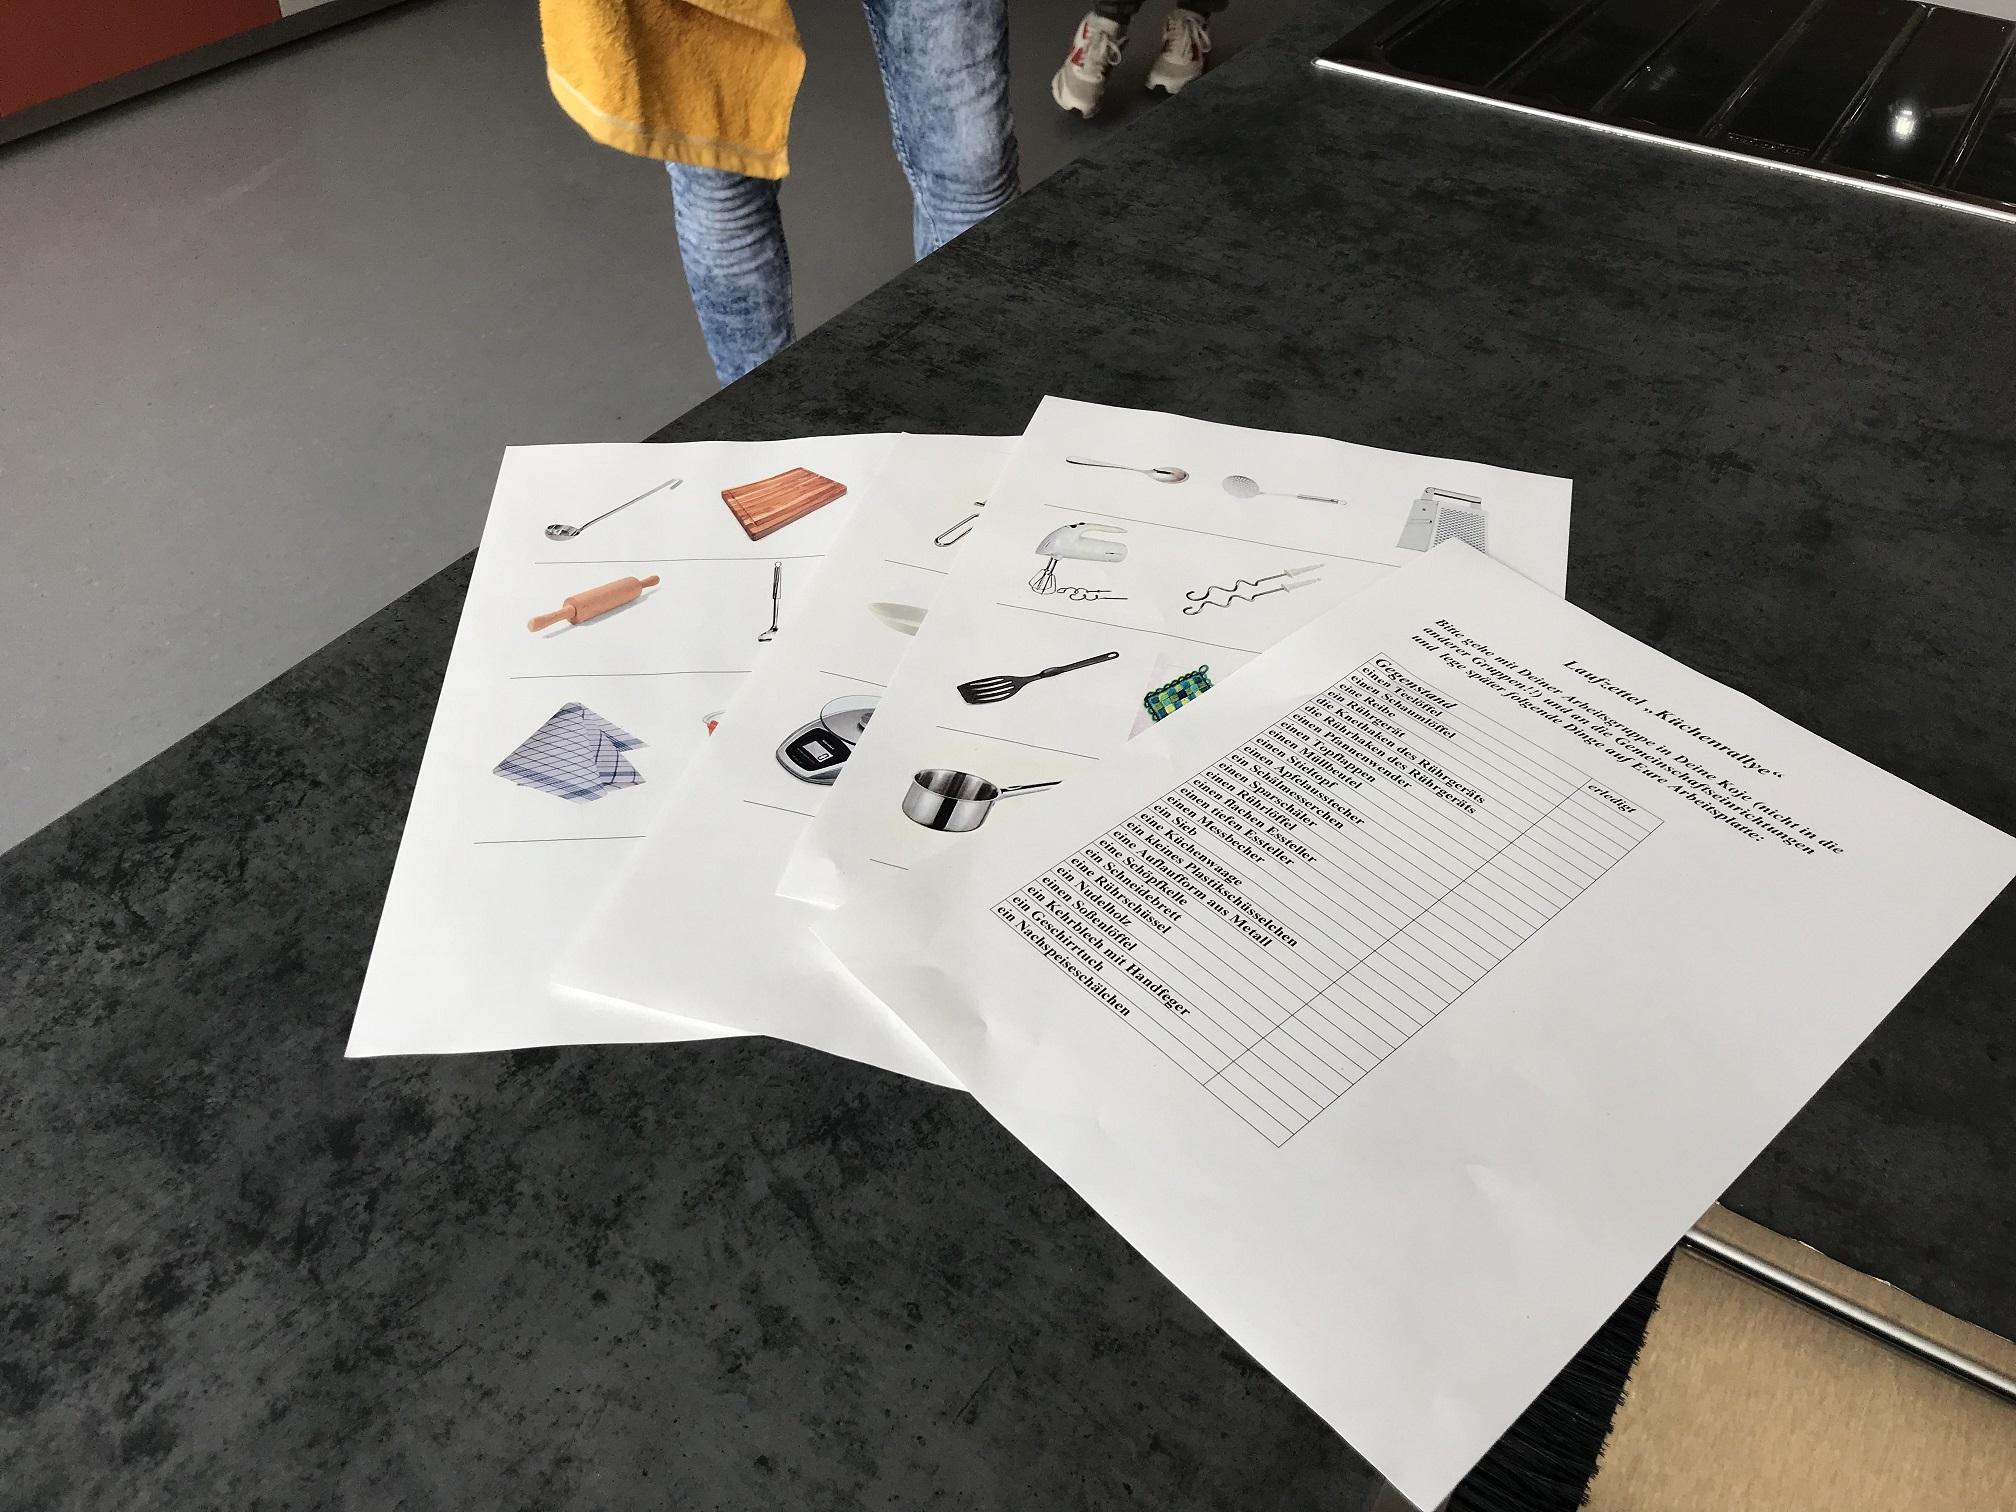 Groß Faktor Trinomialprozess Arbeitsblatt Galerie - Mathe ...